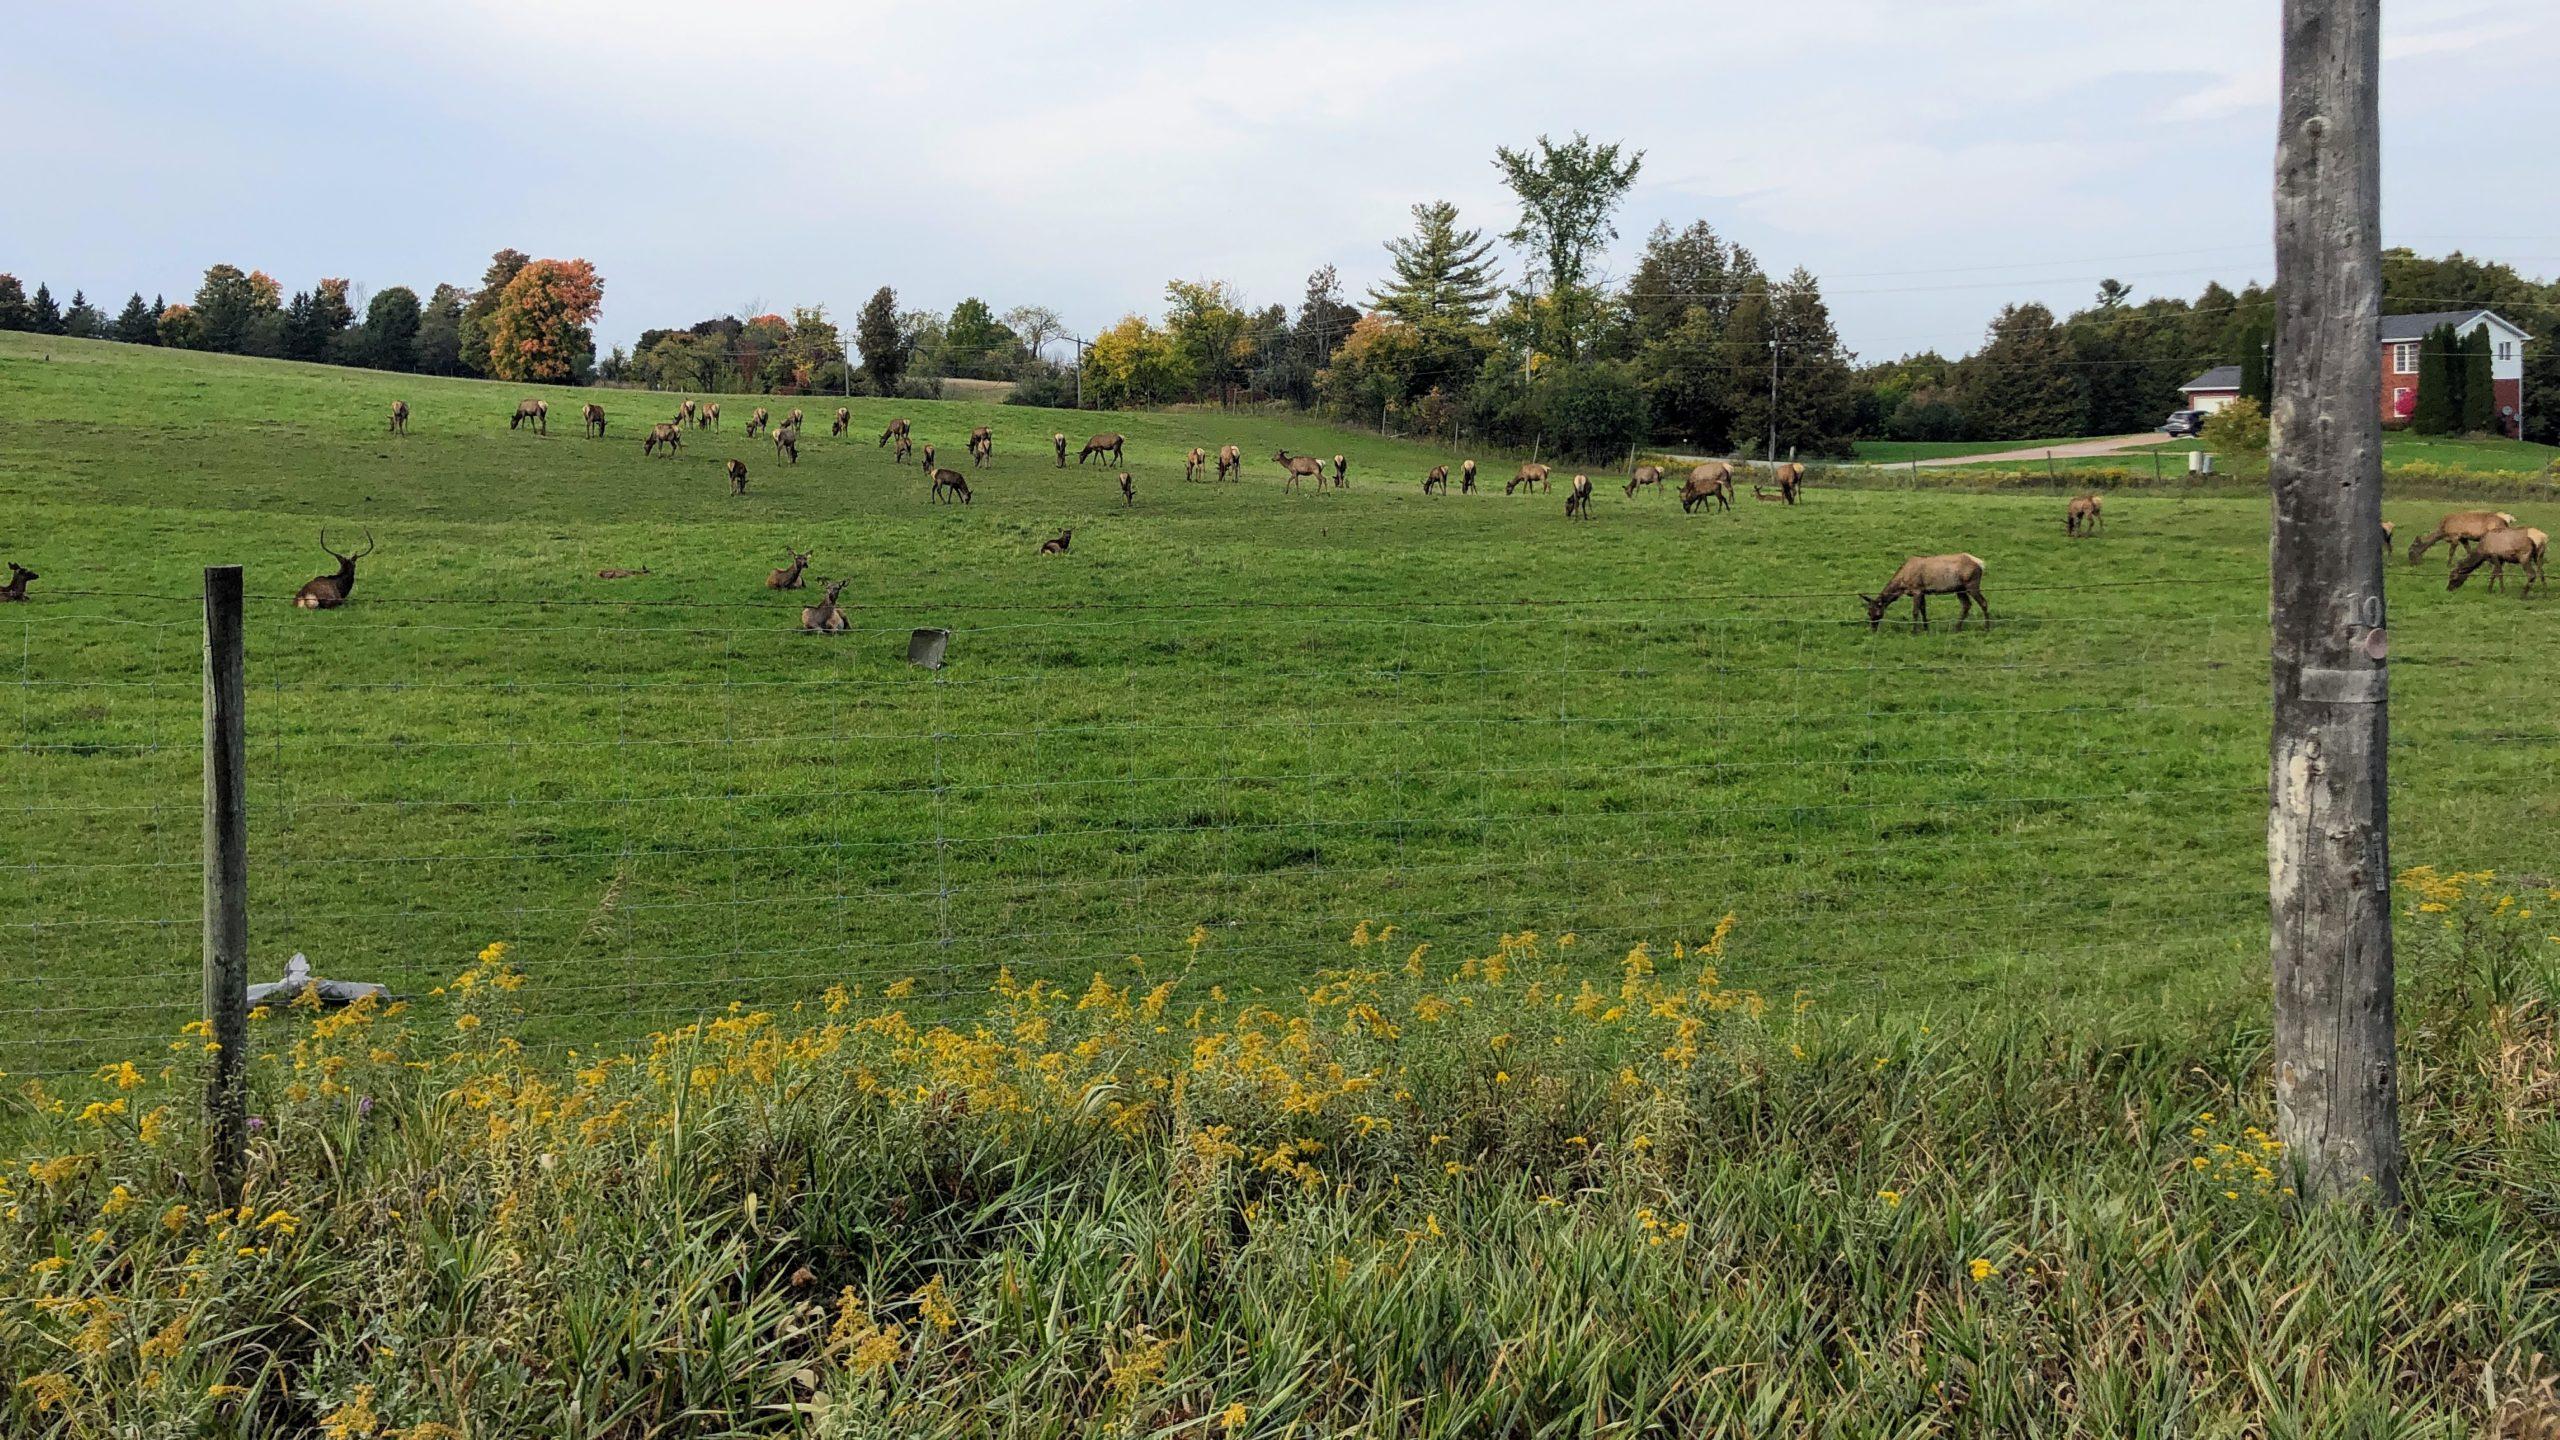 Passing an elk farm on the Durham Destroyer